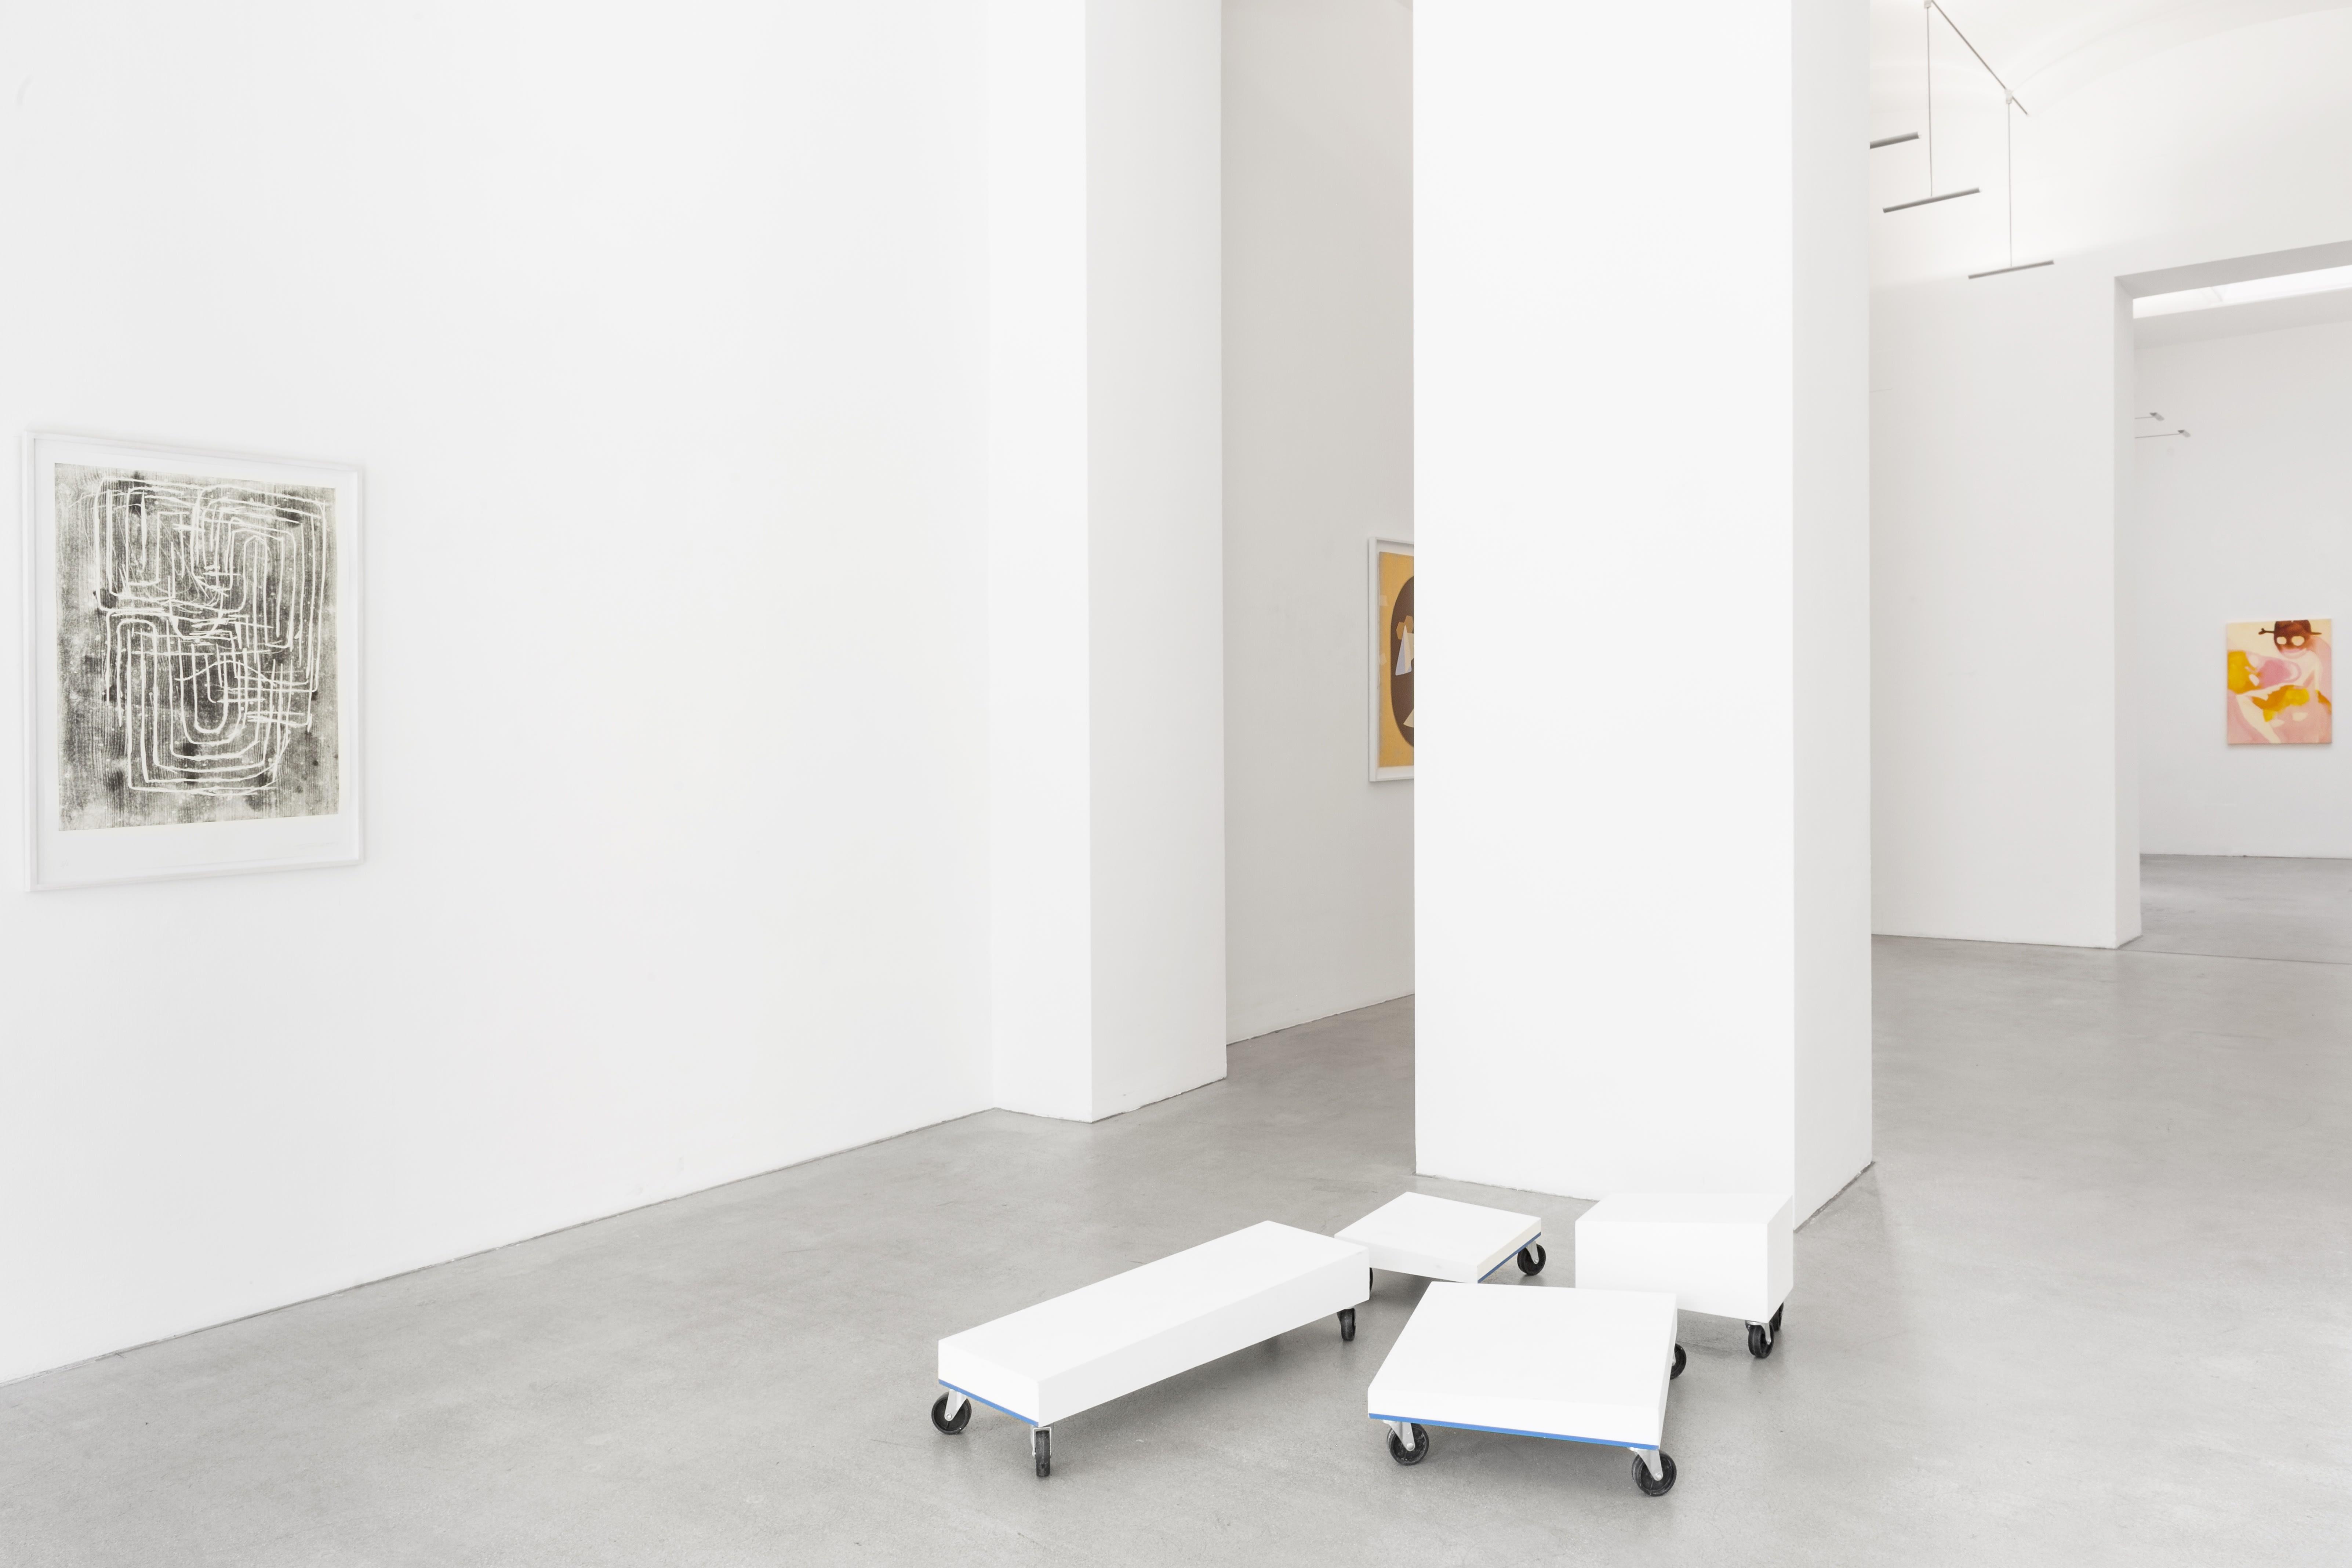 josef zekoff, max landegren, rini tandon, sarah bogner, curated by, hybrides, Unknown identities, installation view, exhbition